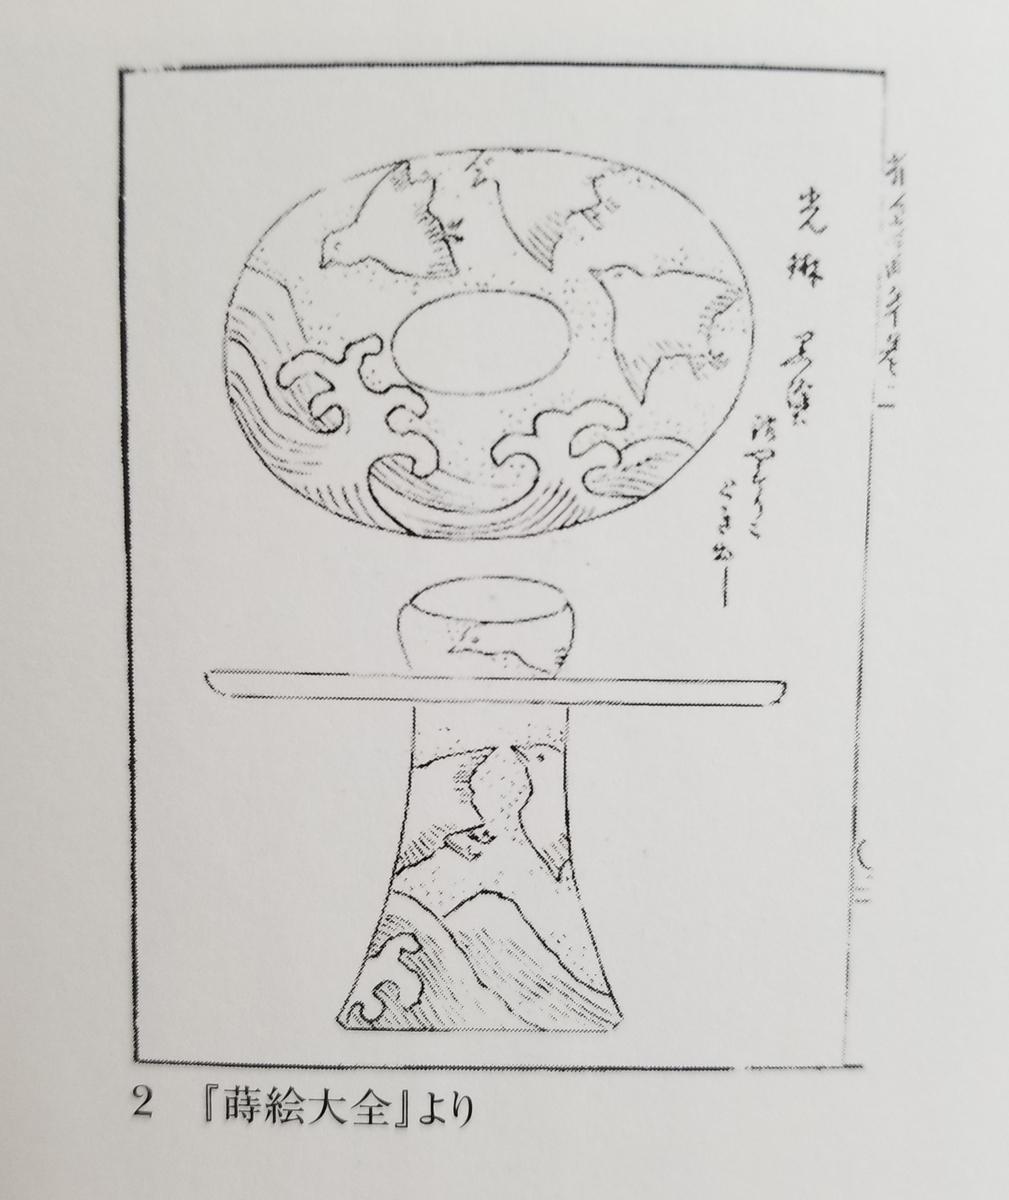 f:id:akashiaya:20200401214627j:plain